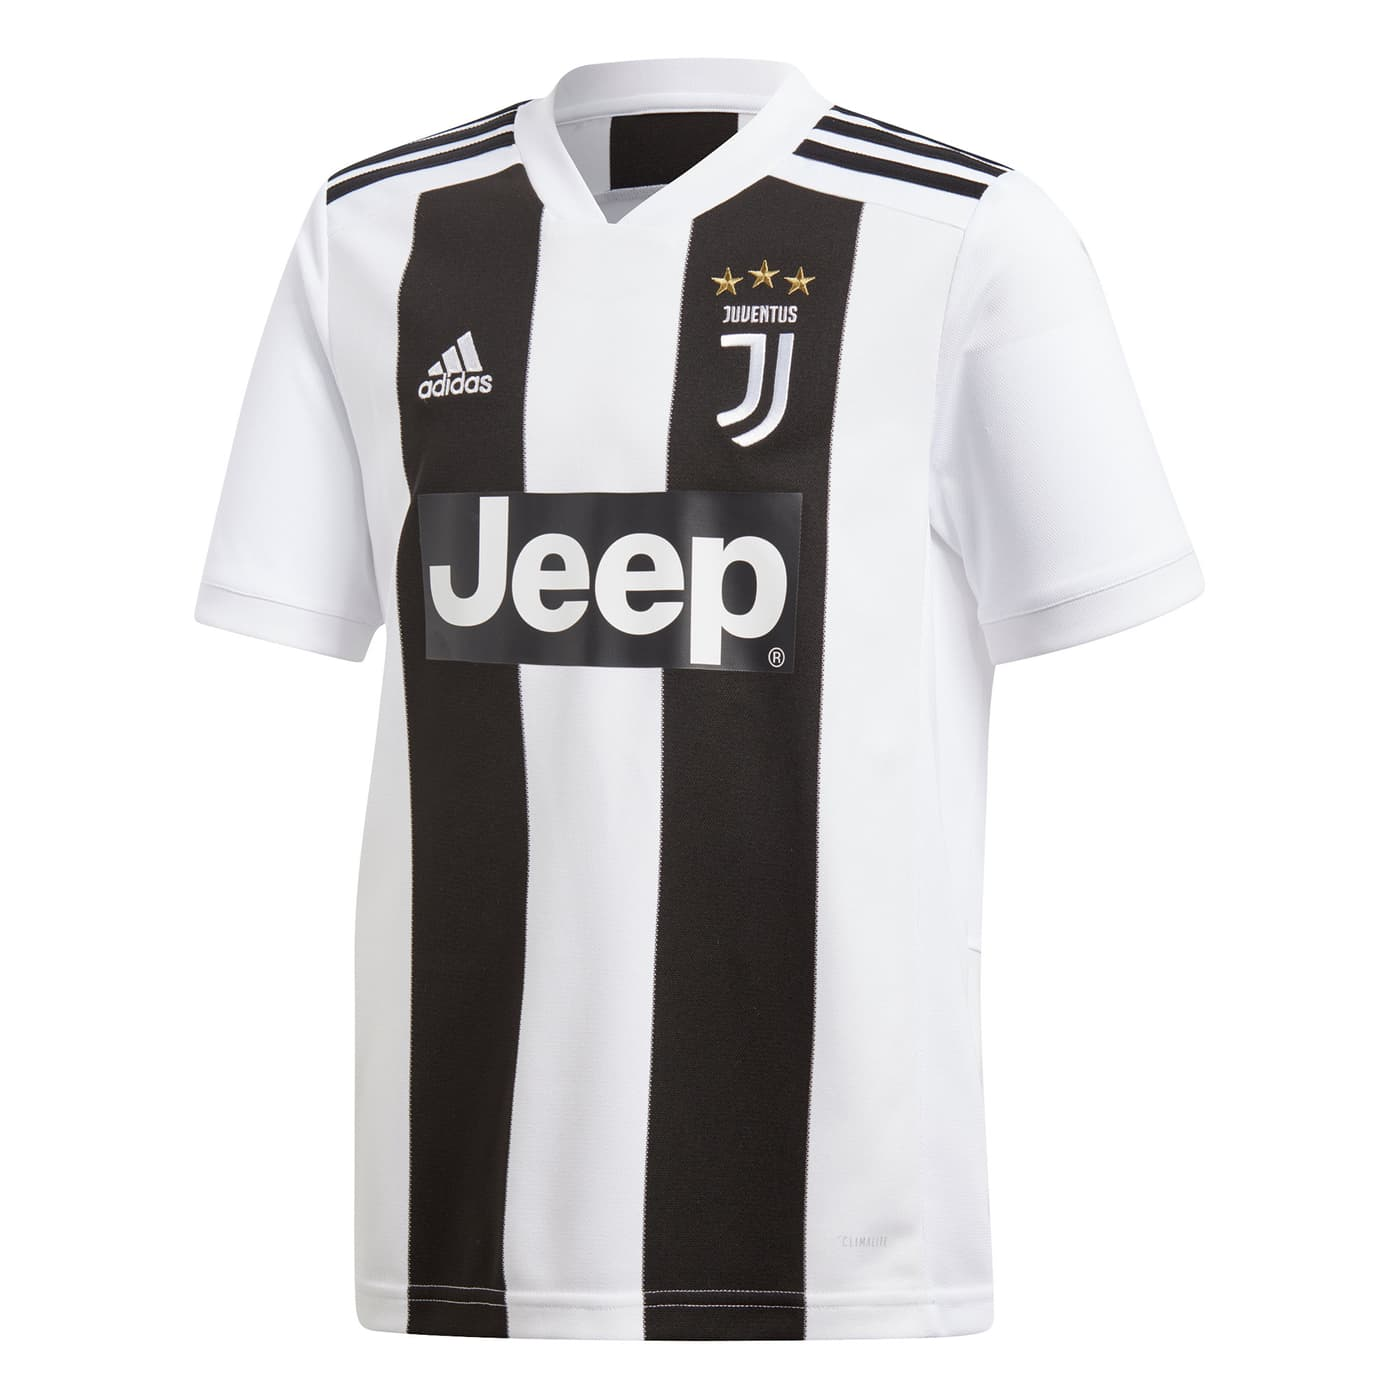 e3b46ea7372c8 Adidas 18/19 JUVENTUS HOME JERSEY YOUTH T-shirt de football pour enfant ...